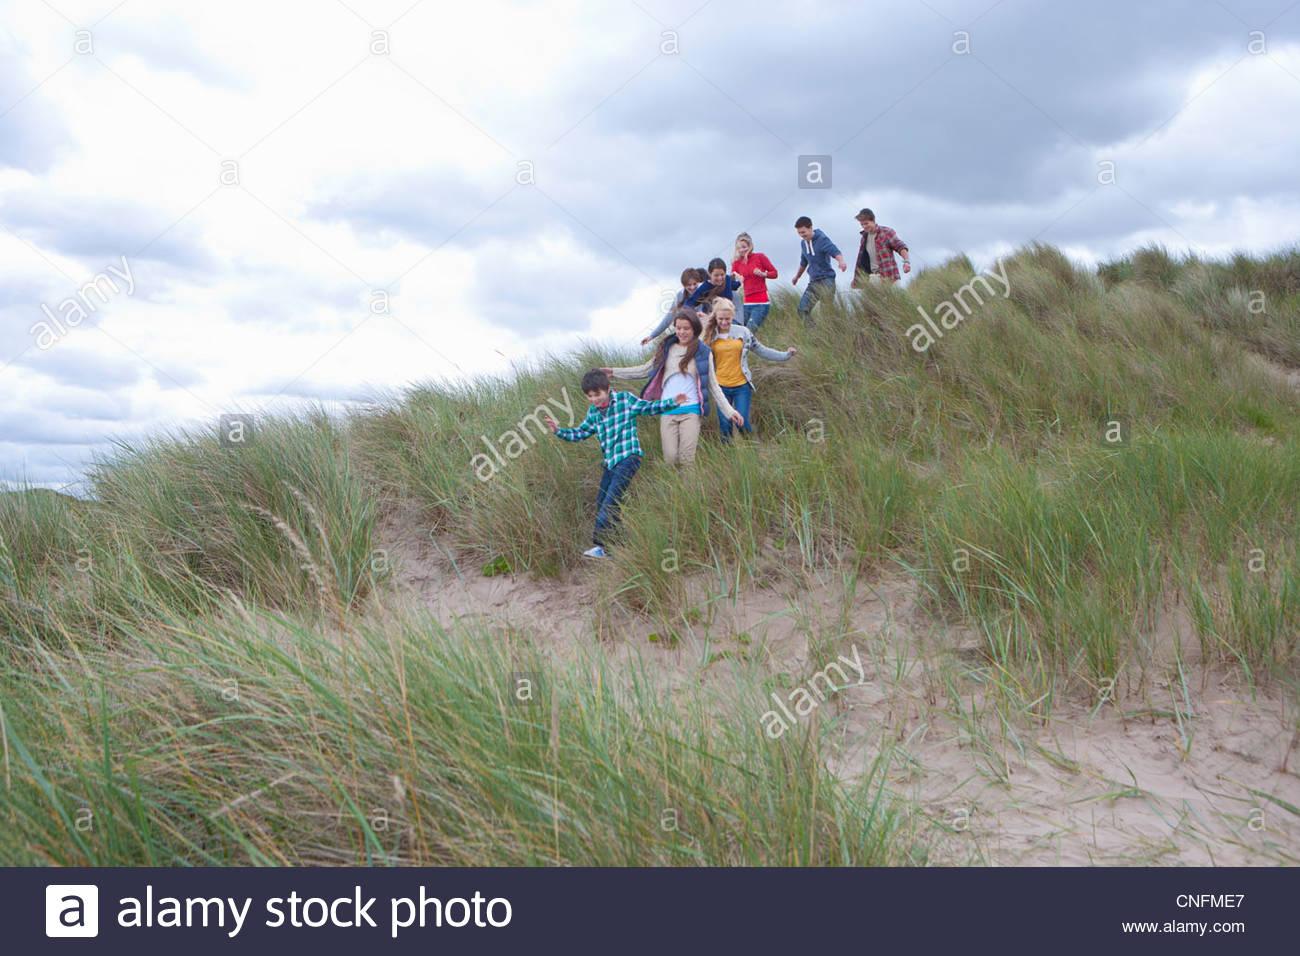 Teenage friends descending grass hill on beach - Stock Image